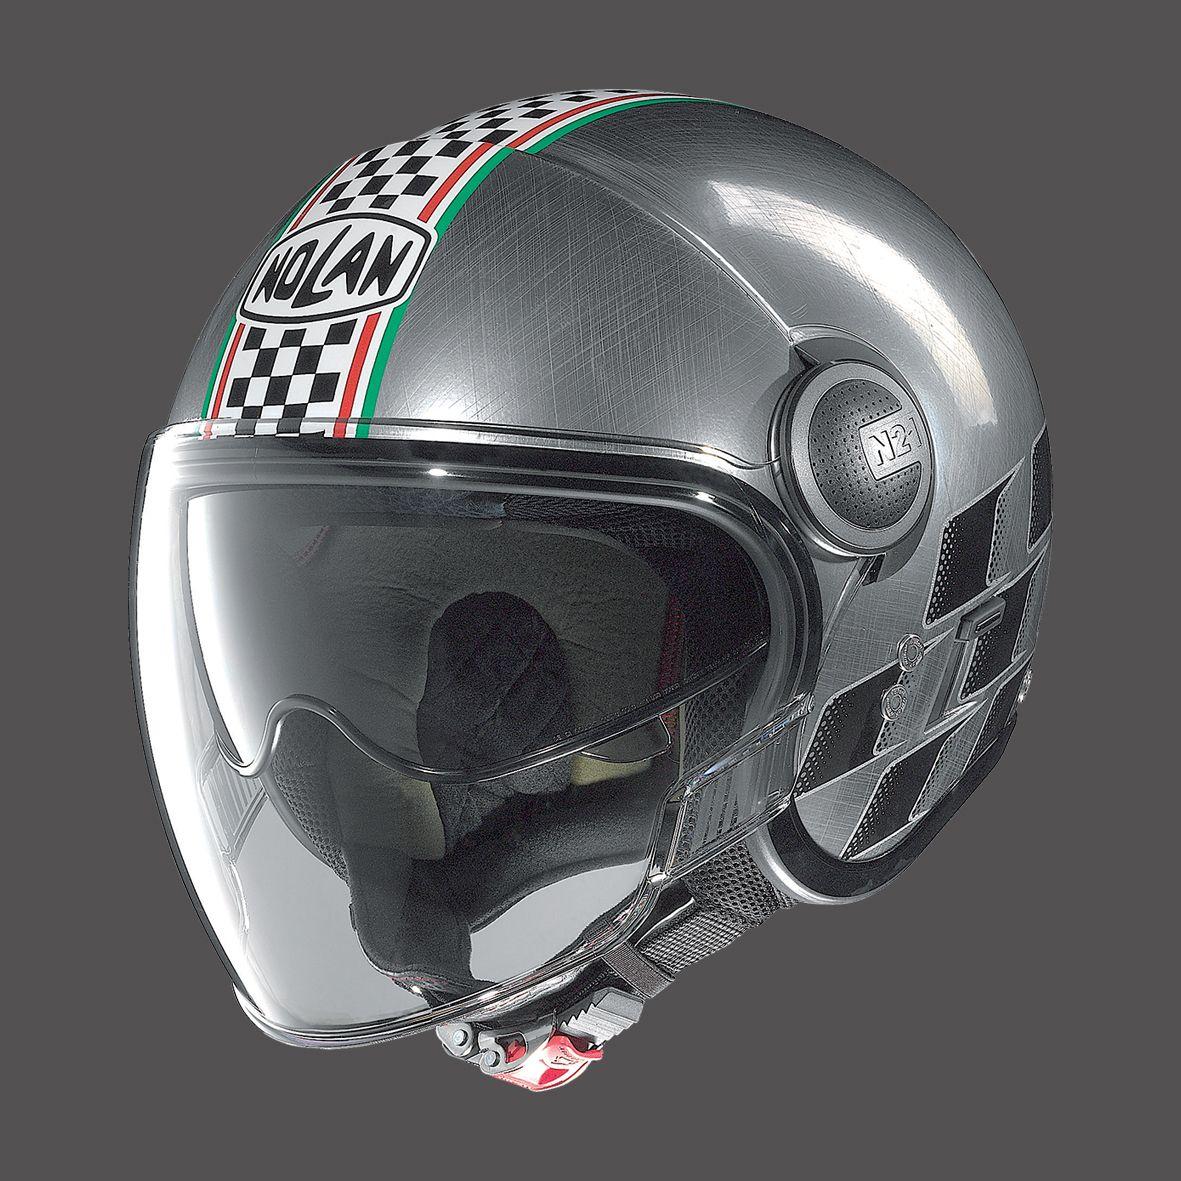 casco moto jet nolan n21 visor scratched chrome asso caschi jet per moto pinterest visors. Black Bedroom Furniture Sets. Home Design Ideas